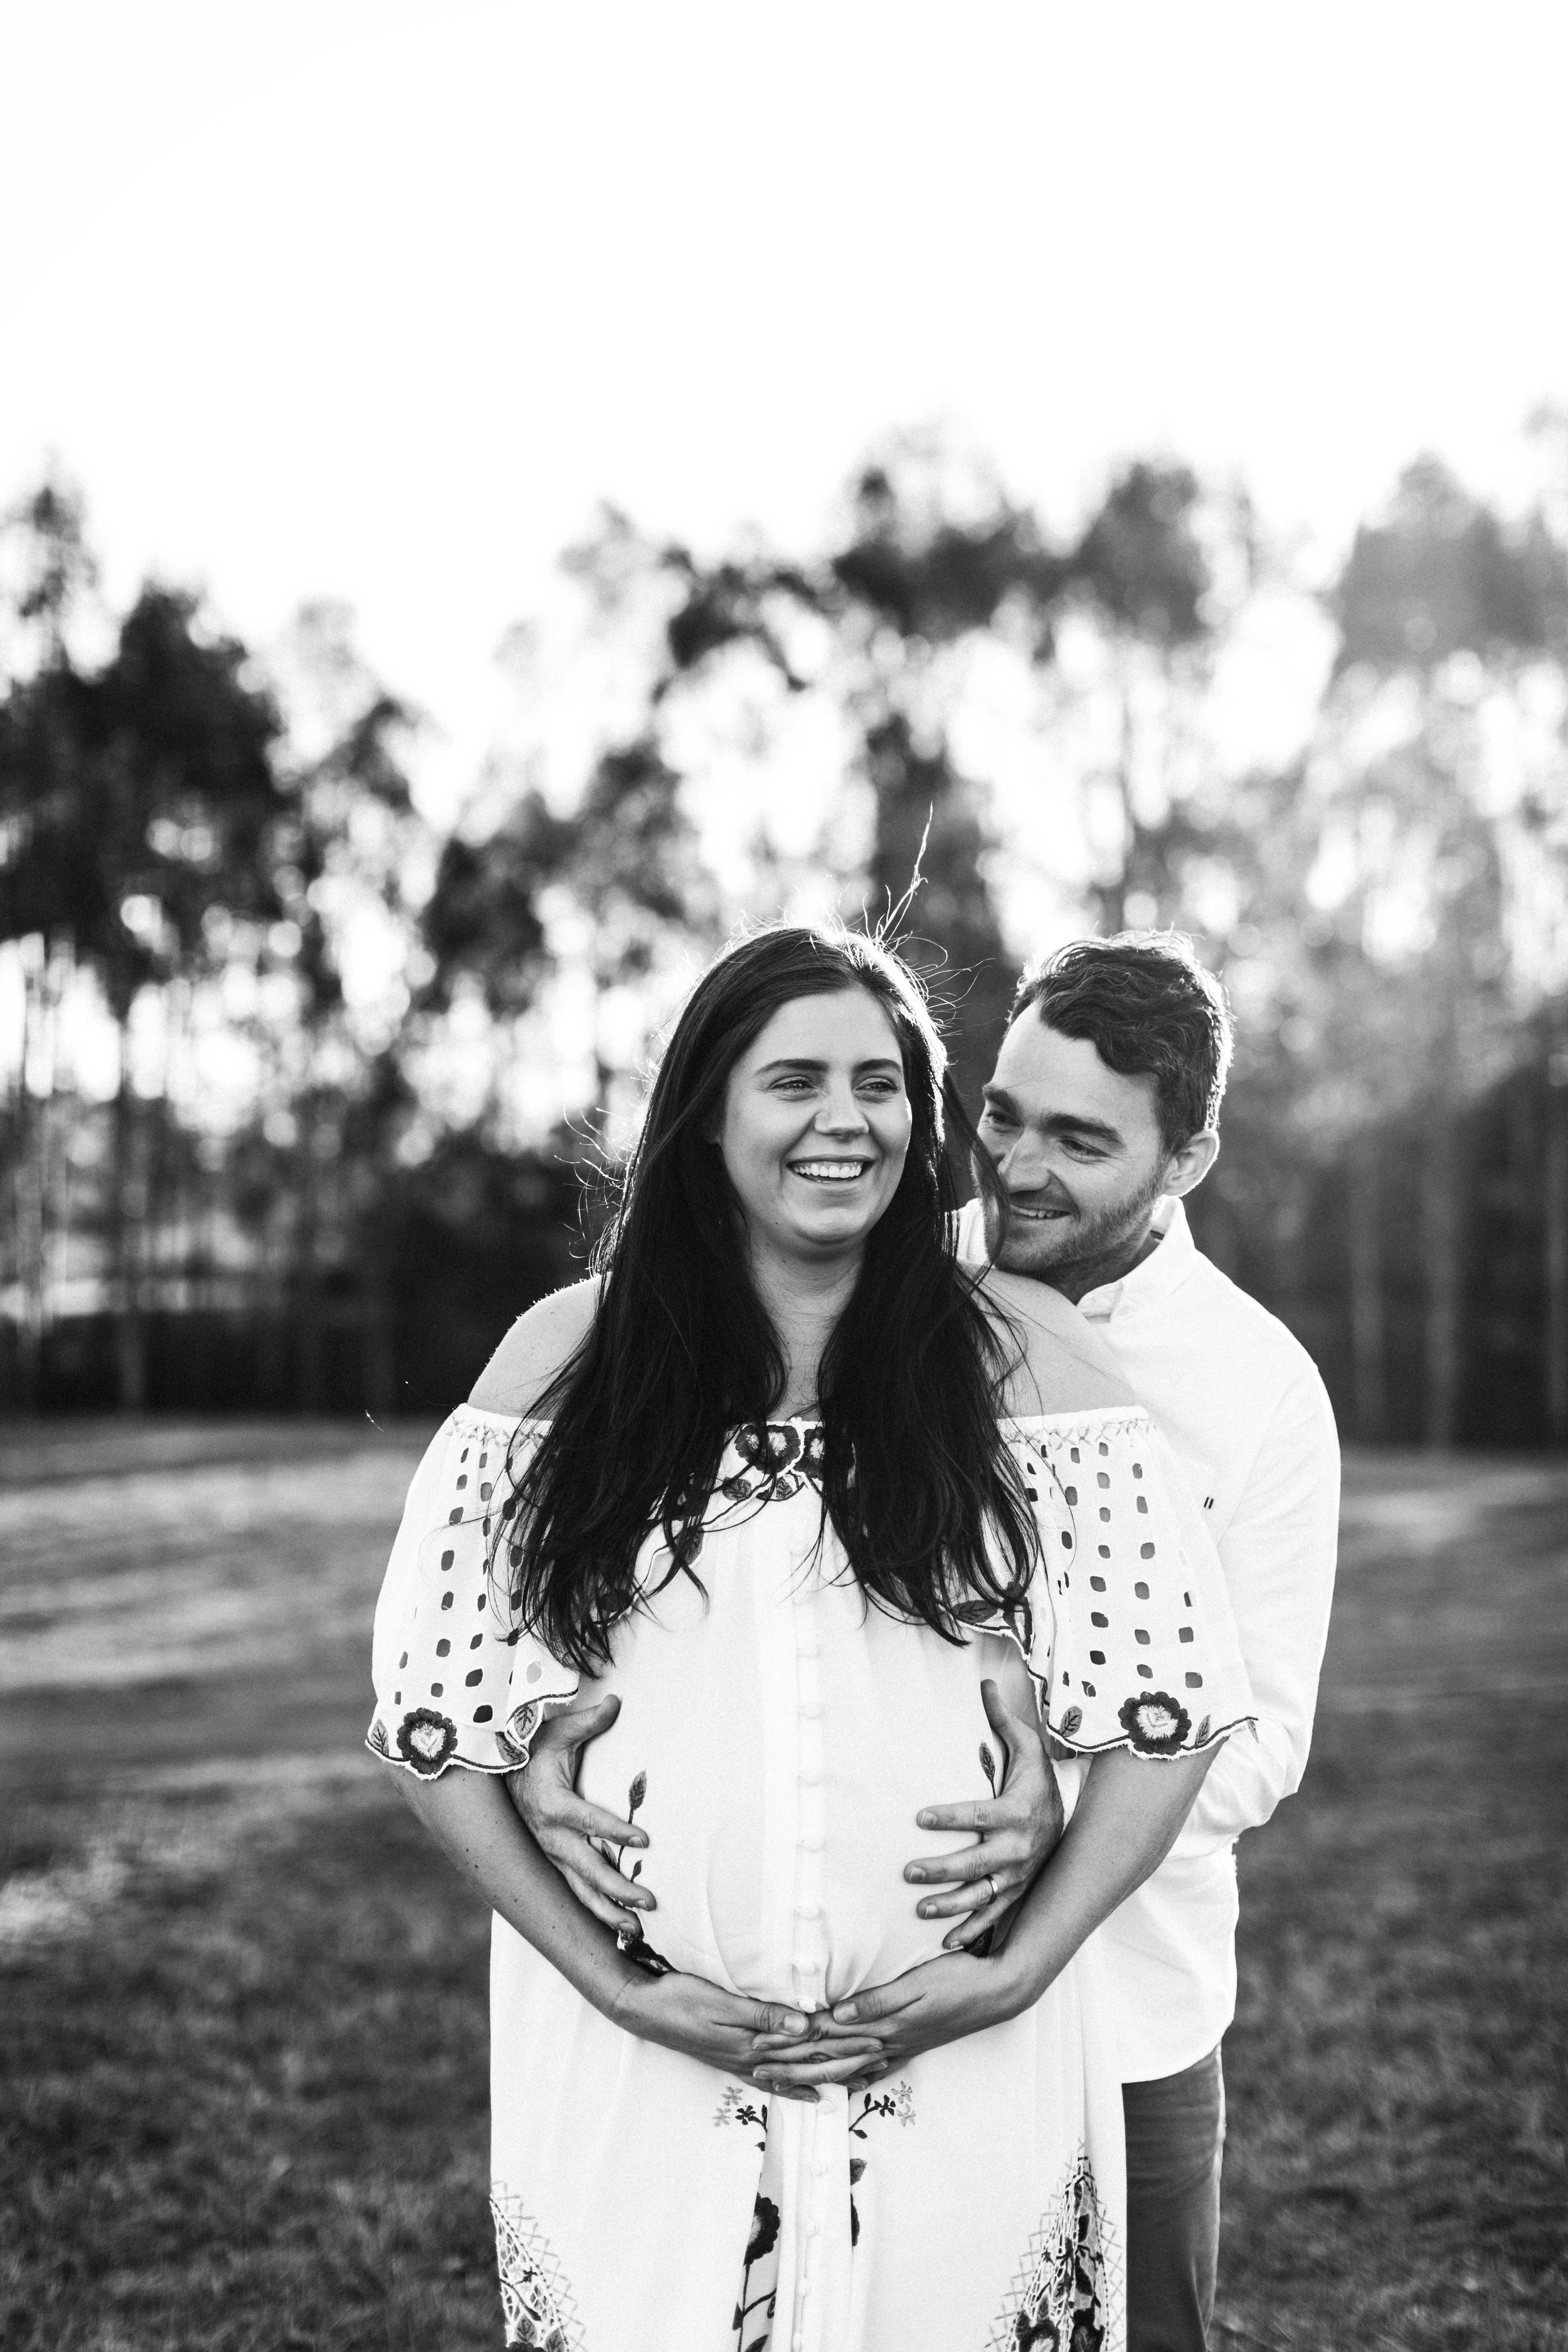 camden-maternity-session-emilyobrienphotography.net-2.jpg